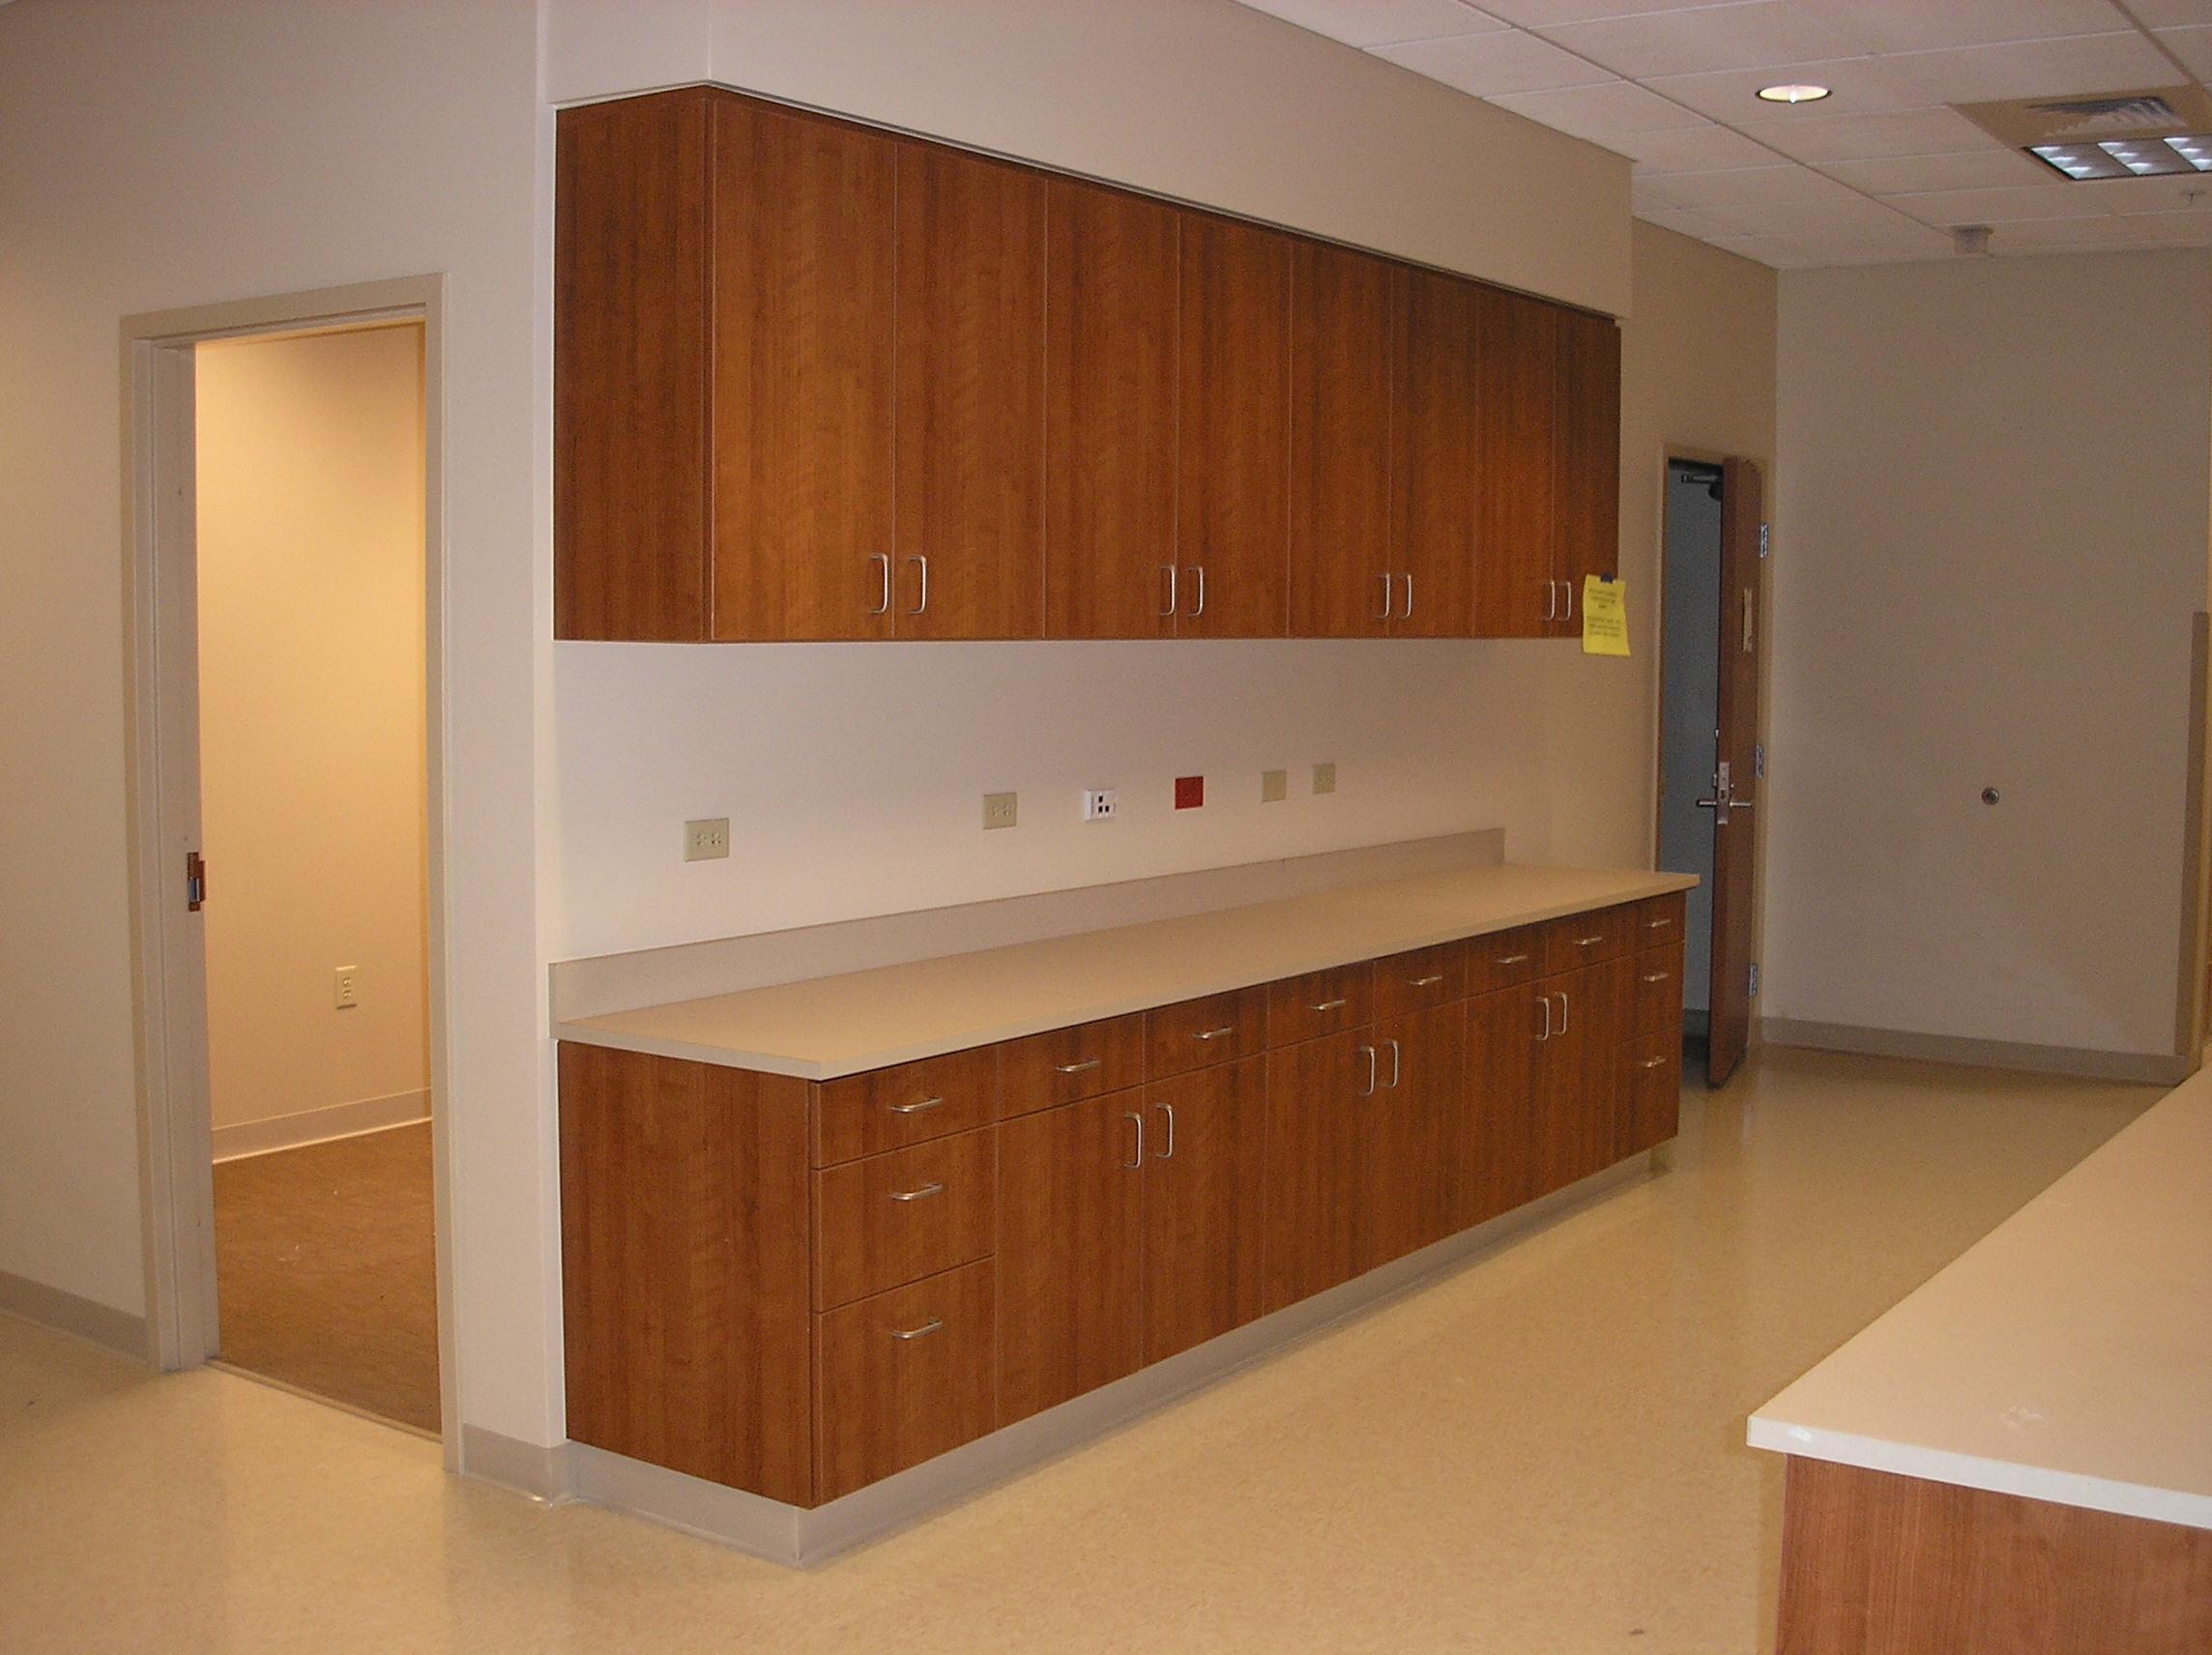 Frisco hospital 13.JPG